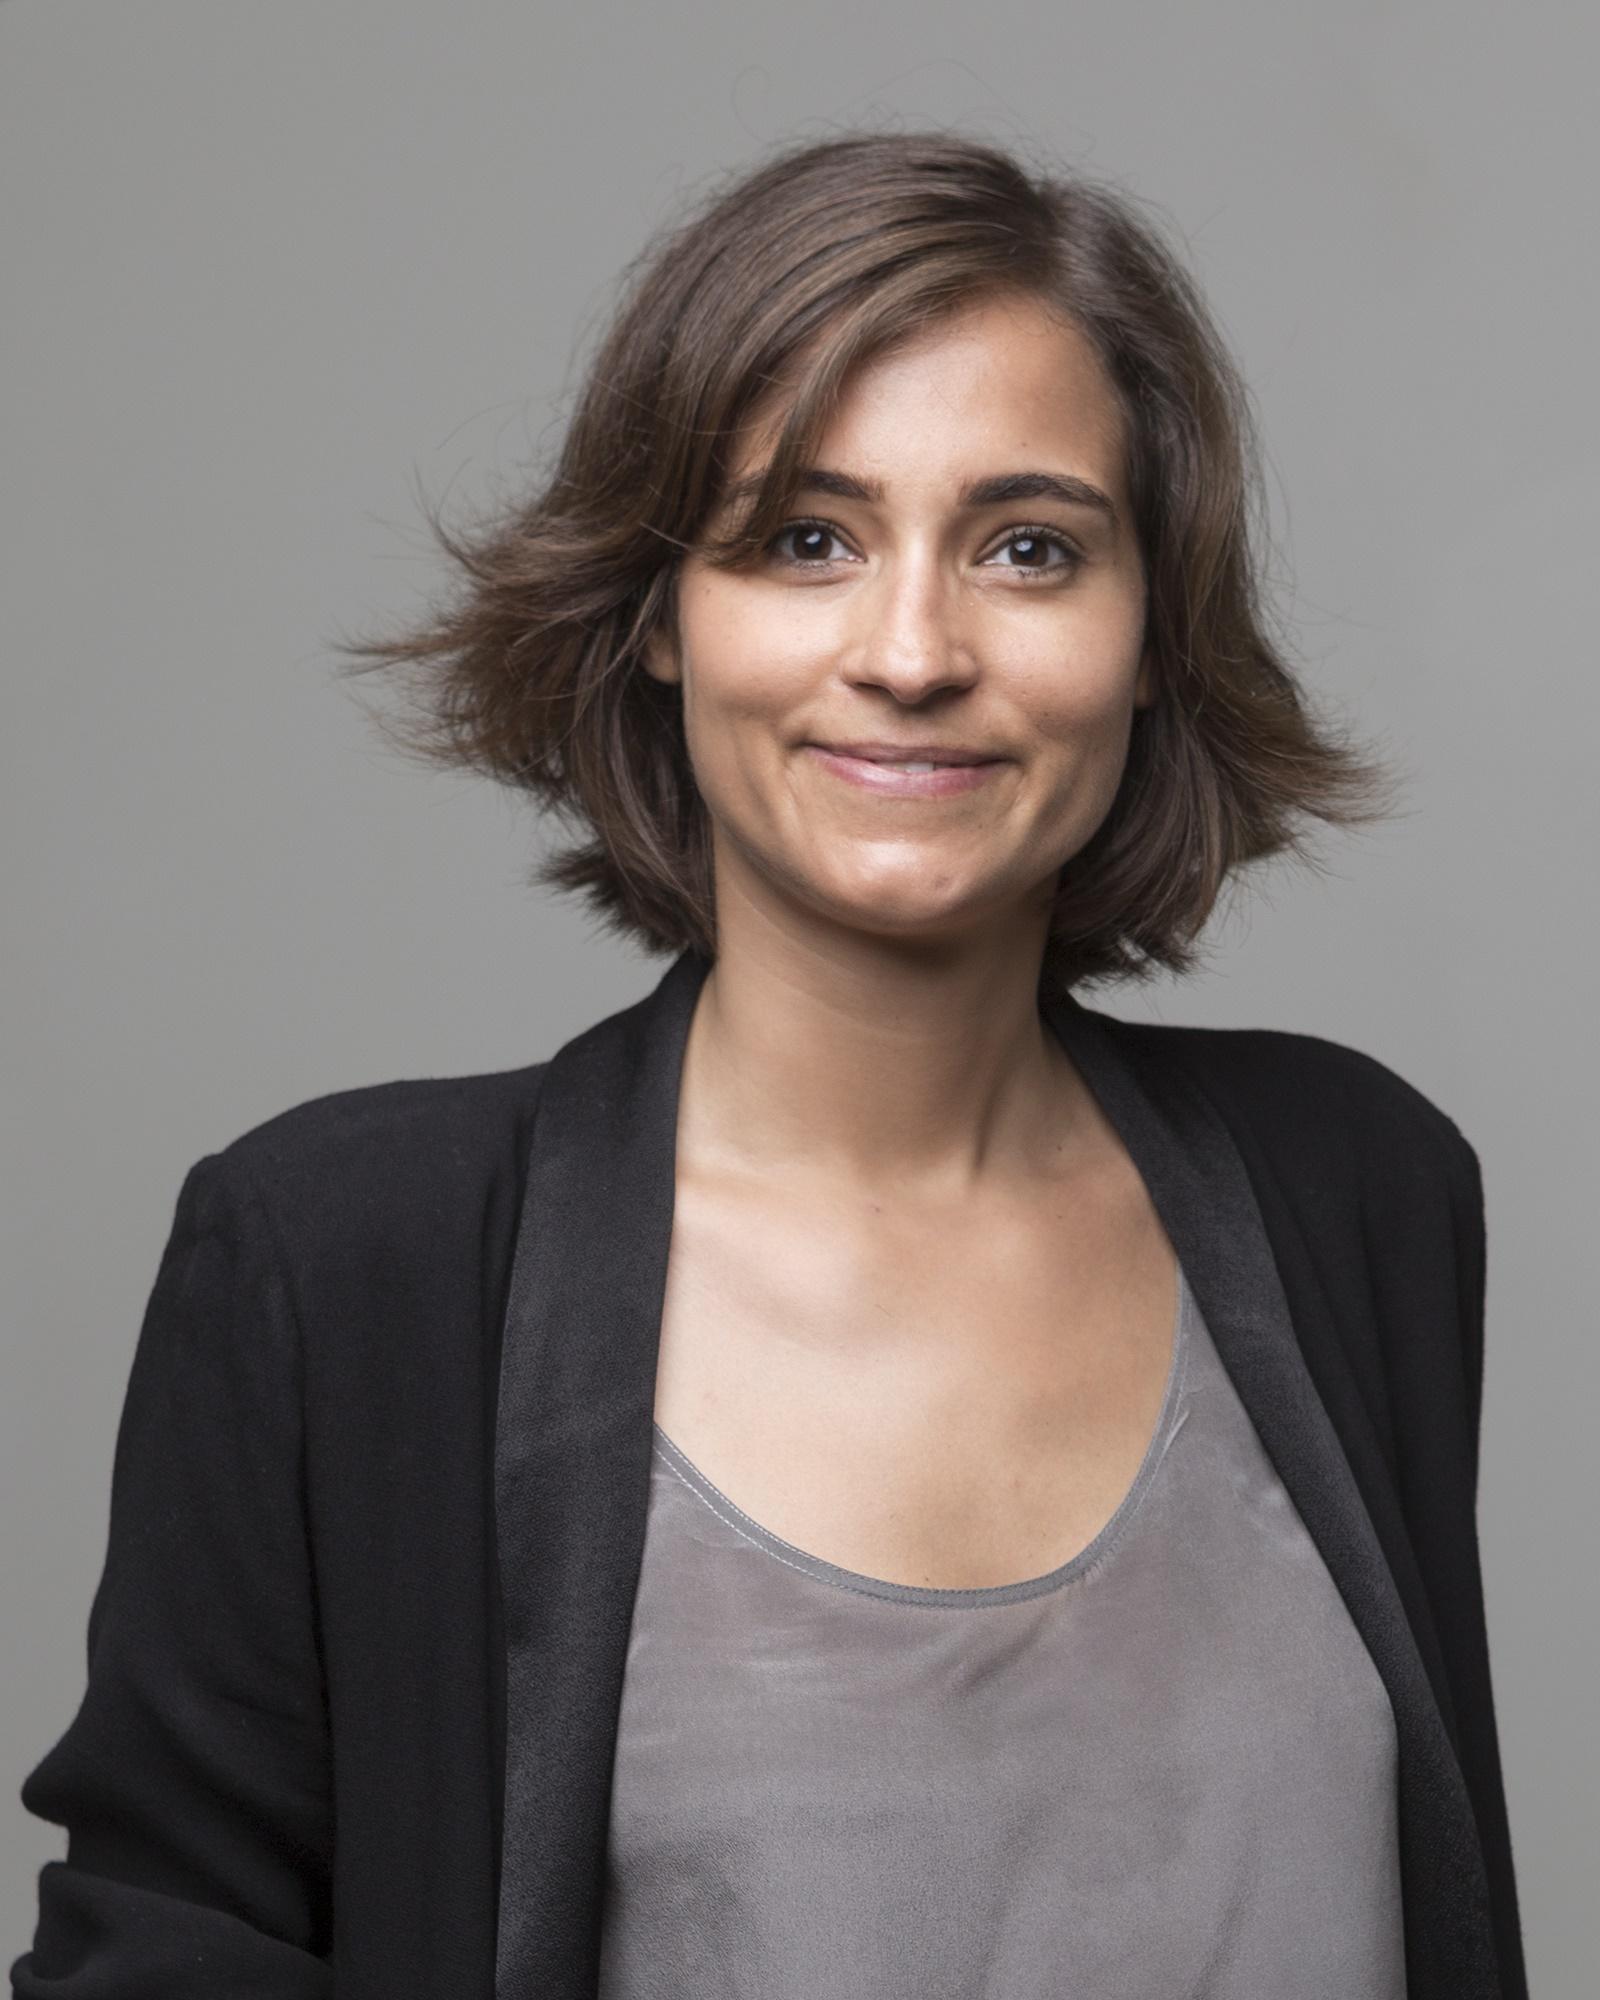 Delphine Veaudor